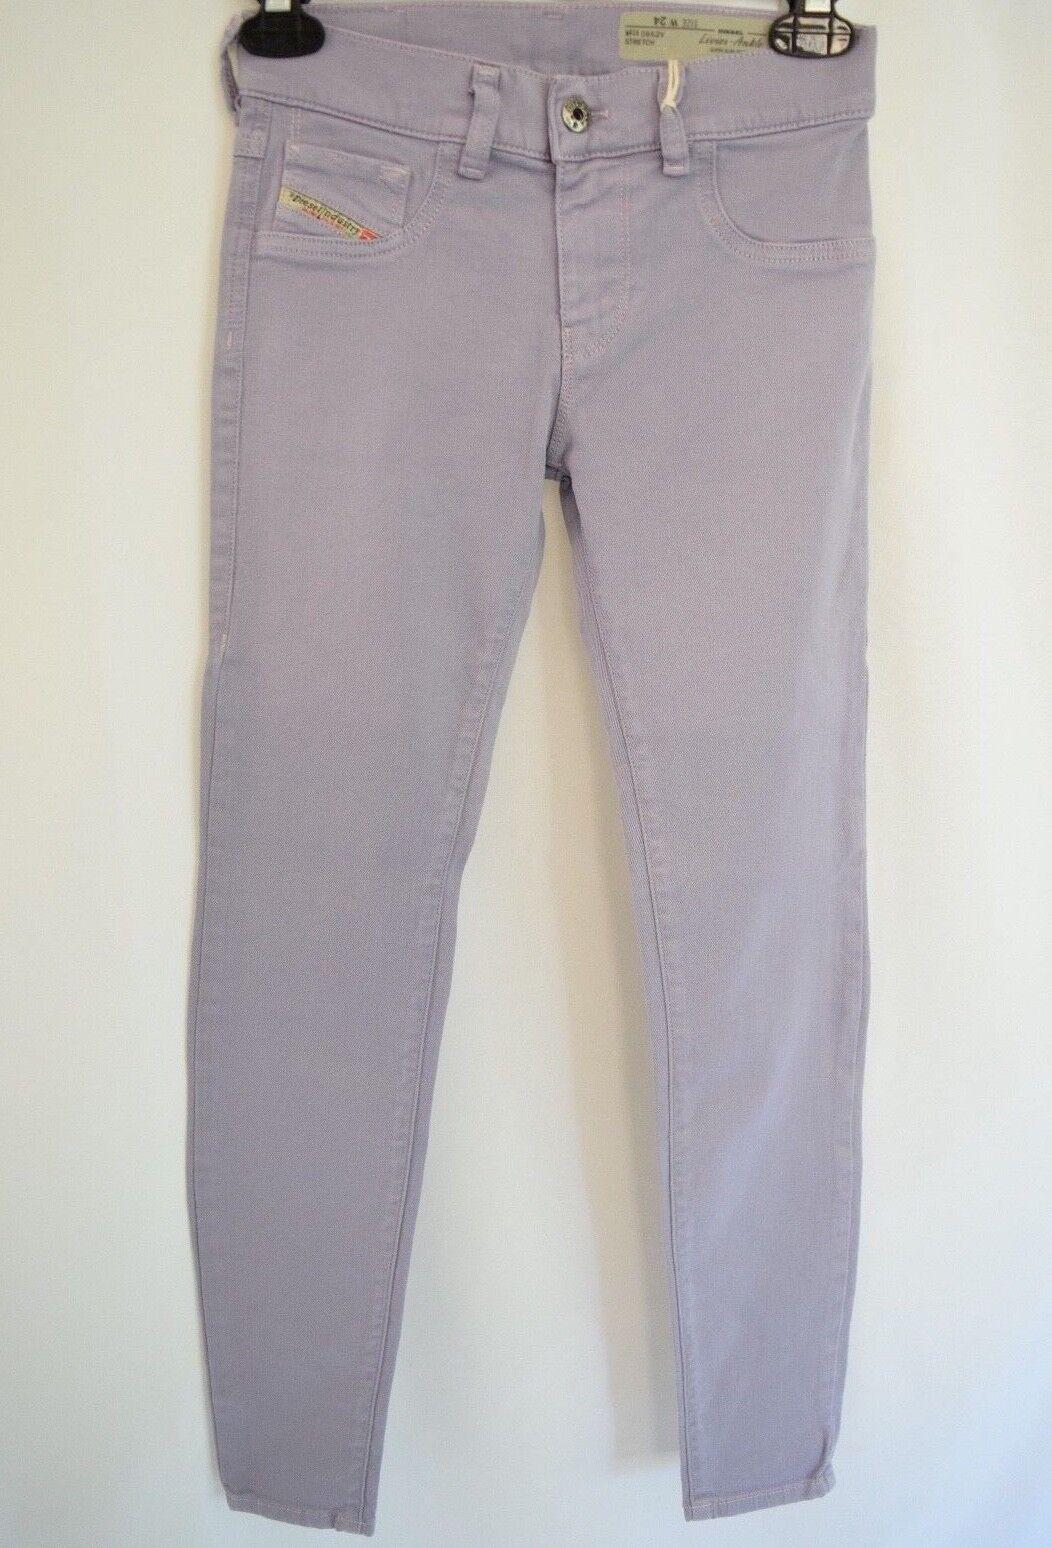 DIESEL LIVIER ANKLE  SUPER SLIM JEGGING Jeans Woman SZ 24 in PURPLE